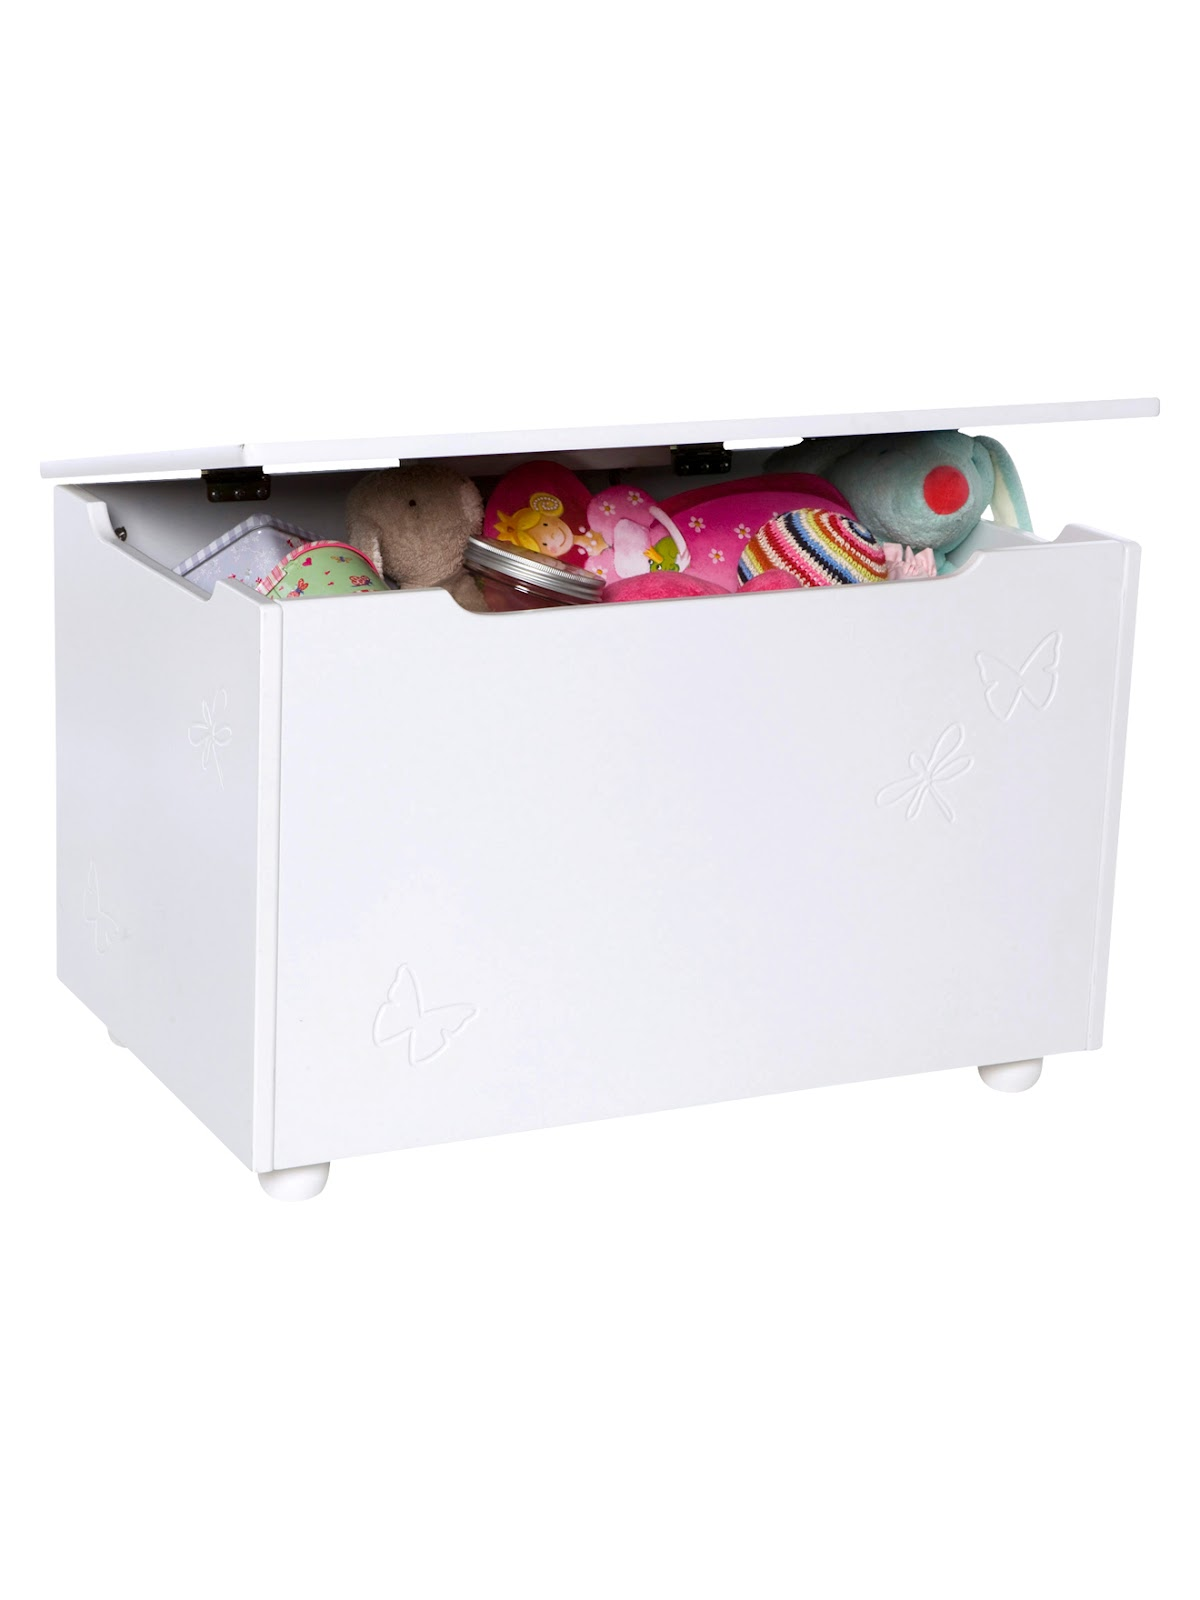 Comprar ofertas platos de ducha muebles sofas spain - Almacenaje ikea infantil ...